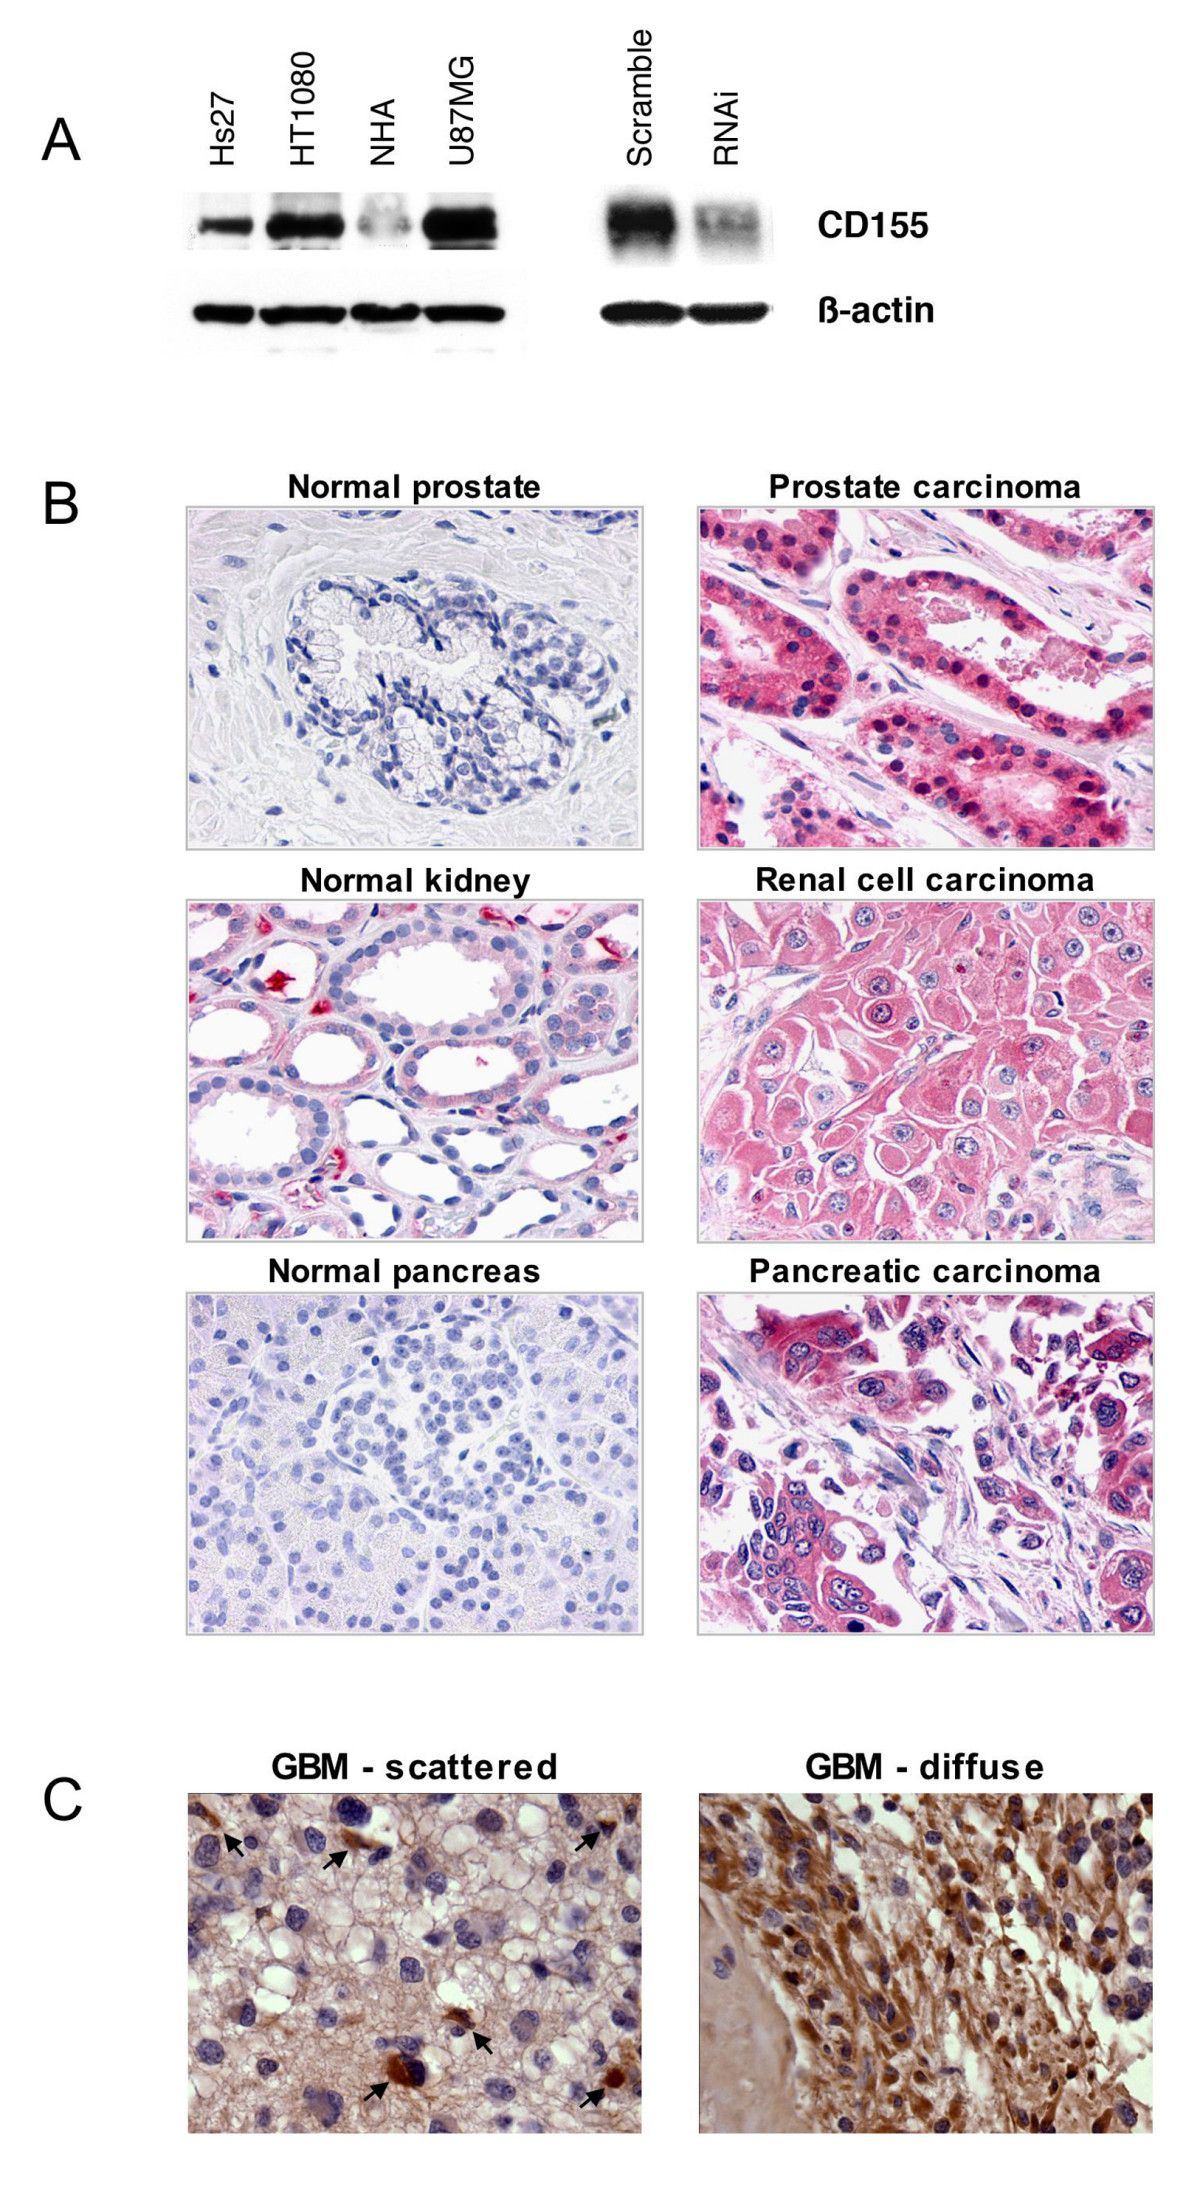 www biomedcentral com - Figure | Human Biology & Anatomy